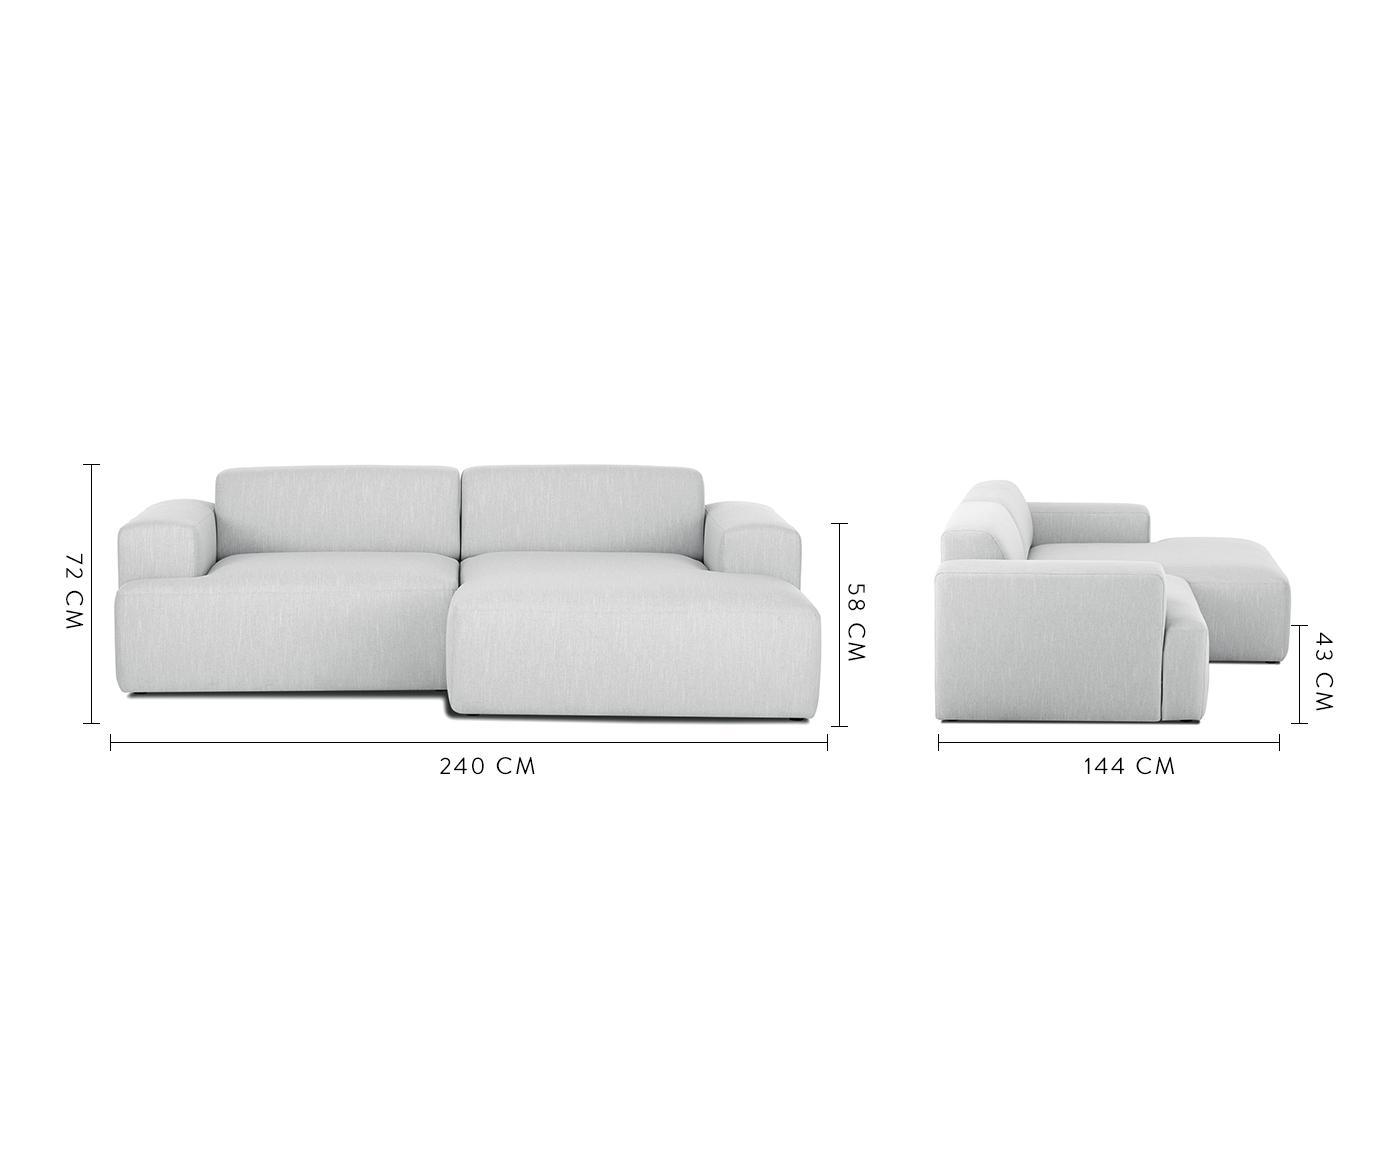 Ecksofa Melva (3-Sitzer), Bezug: Polyester Der hochwertige, Gestell: Massives Kiefernholz, Spa, Füße: Kiefernholz, Webstoff Hellgrau, B 240 x T 144 cm